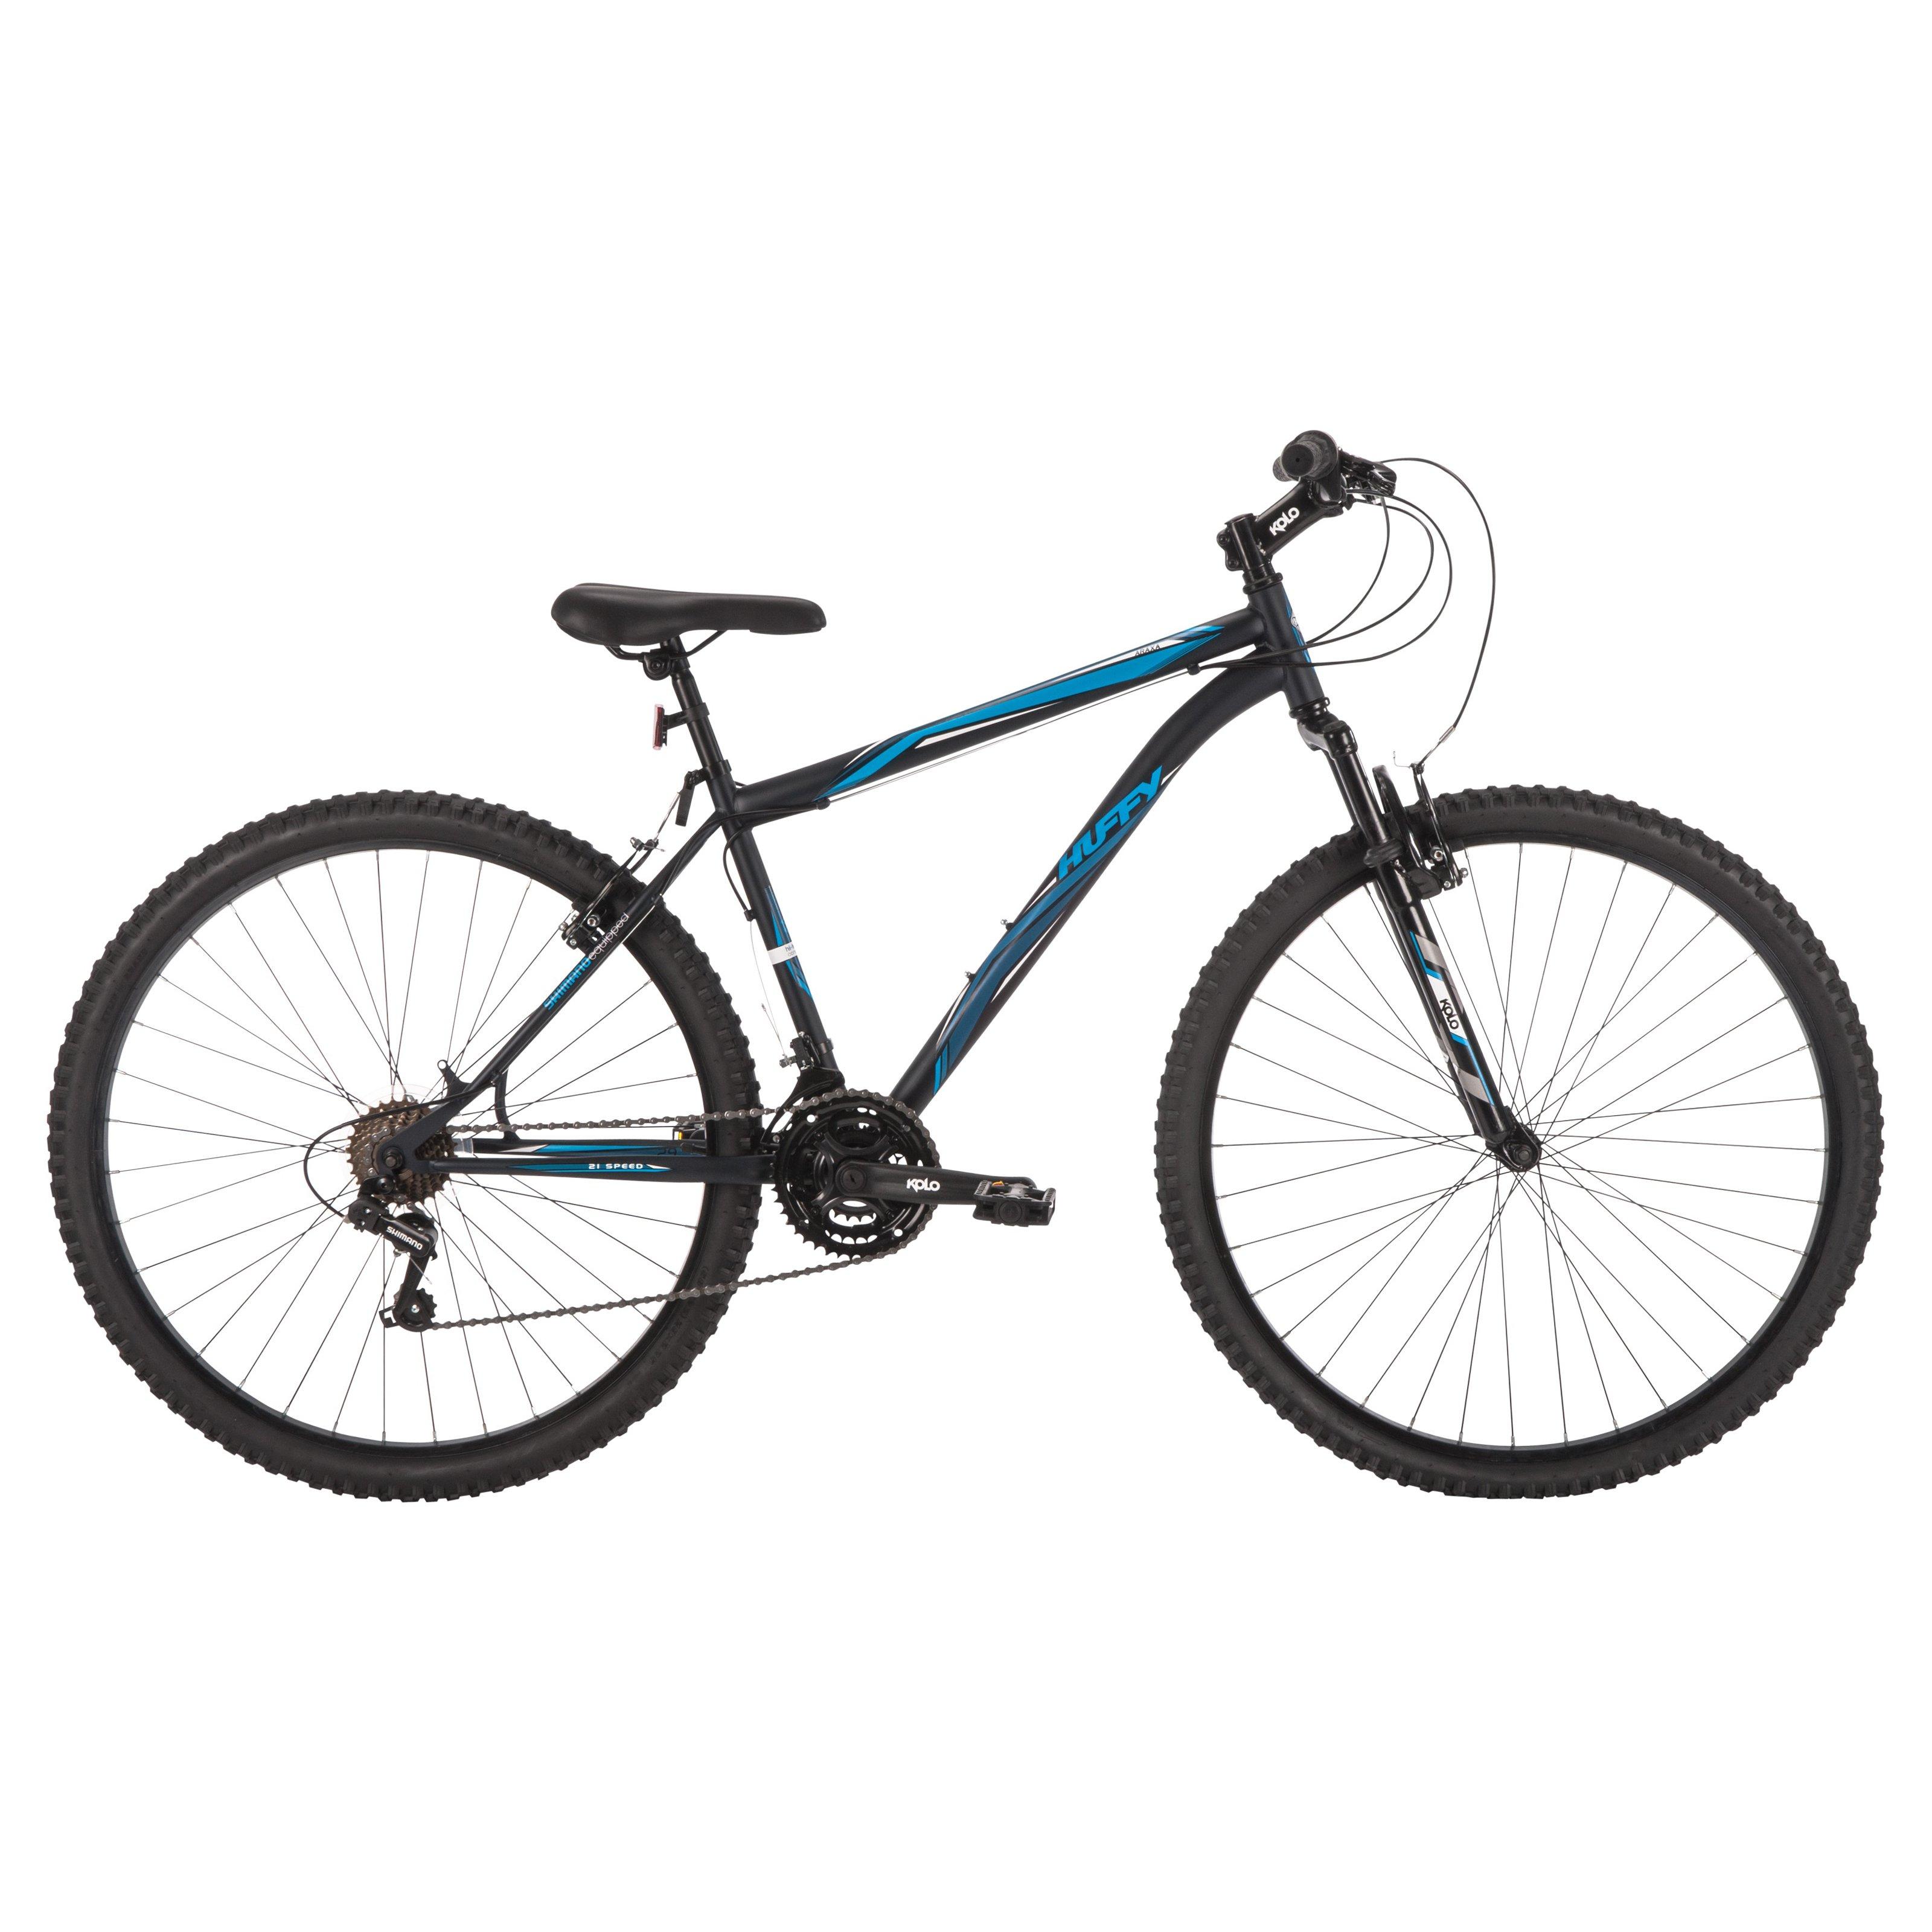 Huffy Araxa 29 in. Mountain Bike